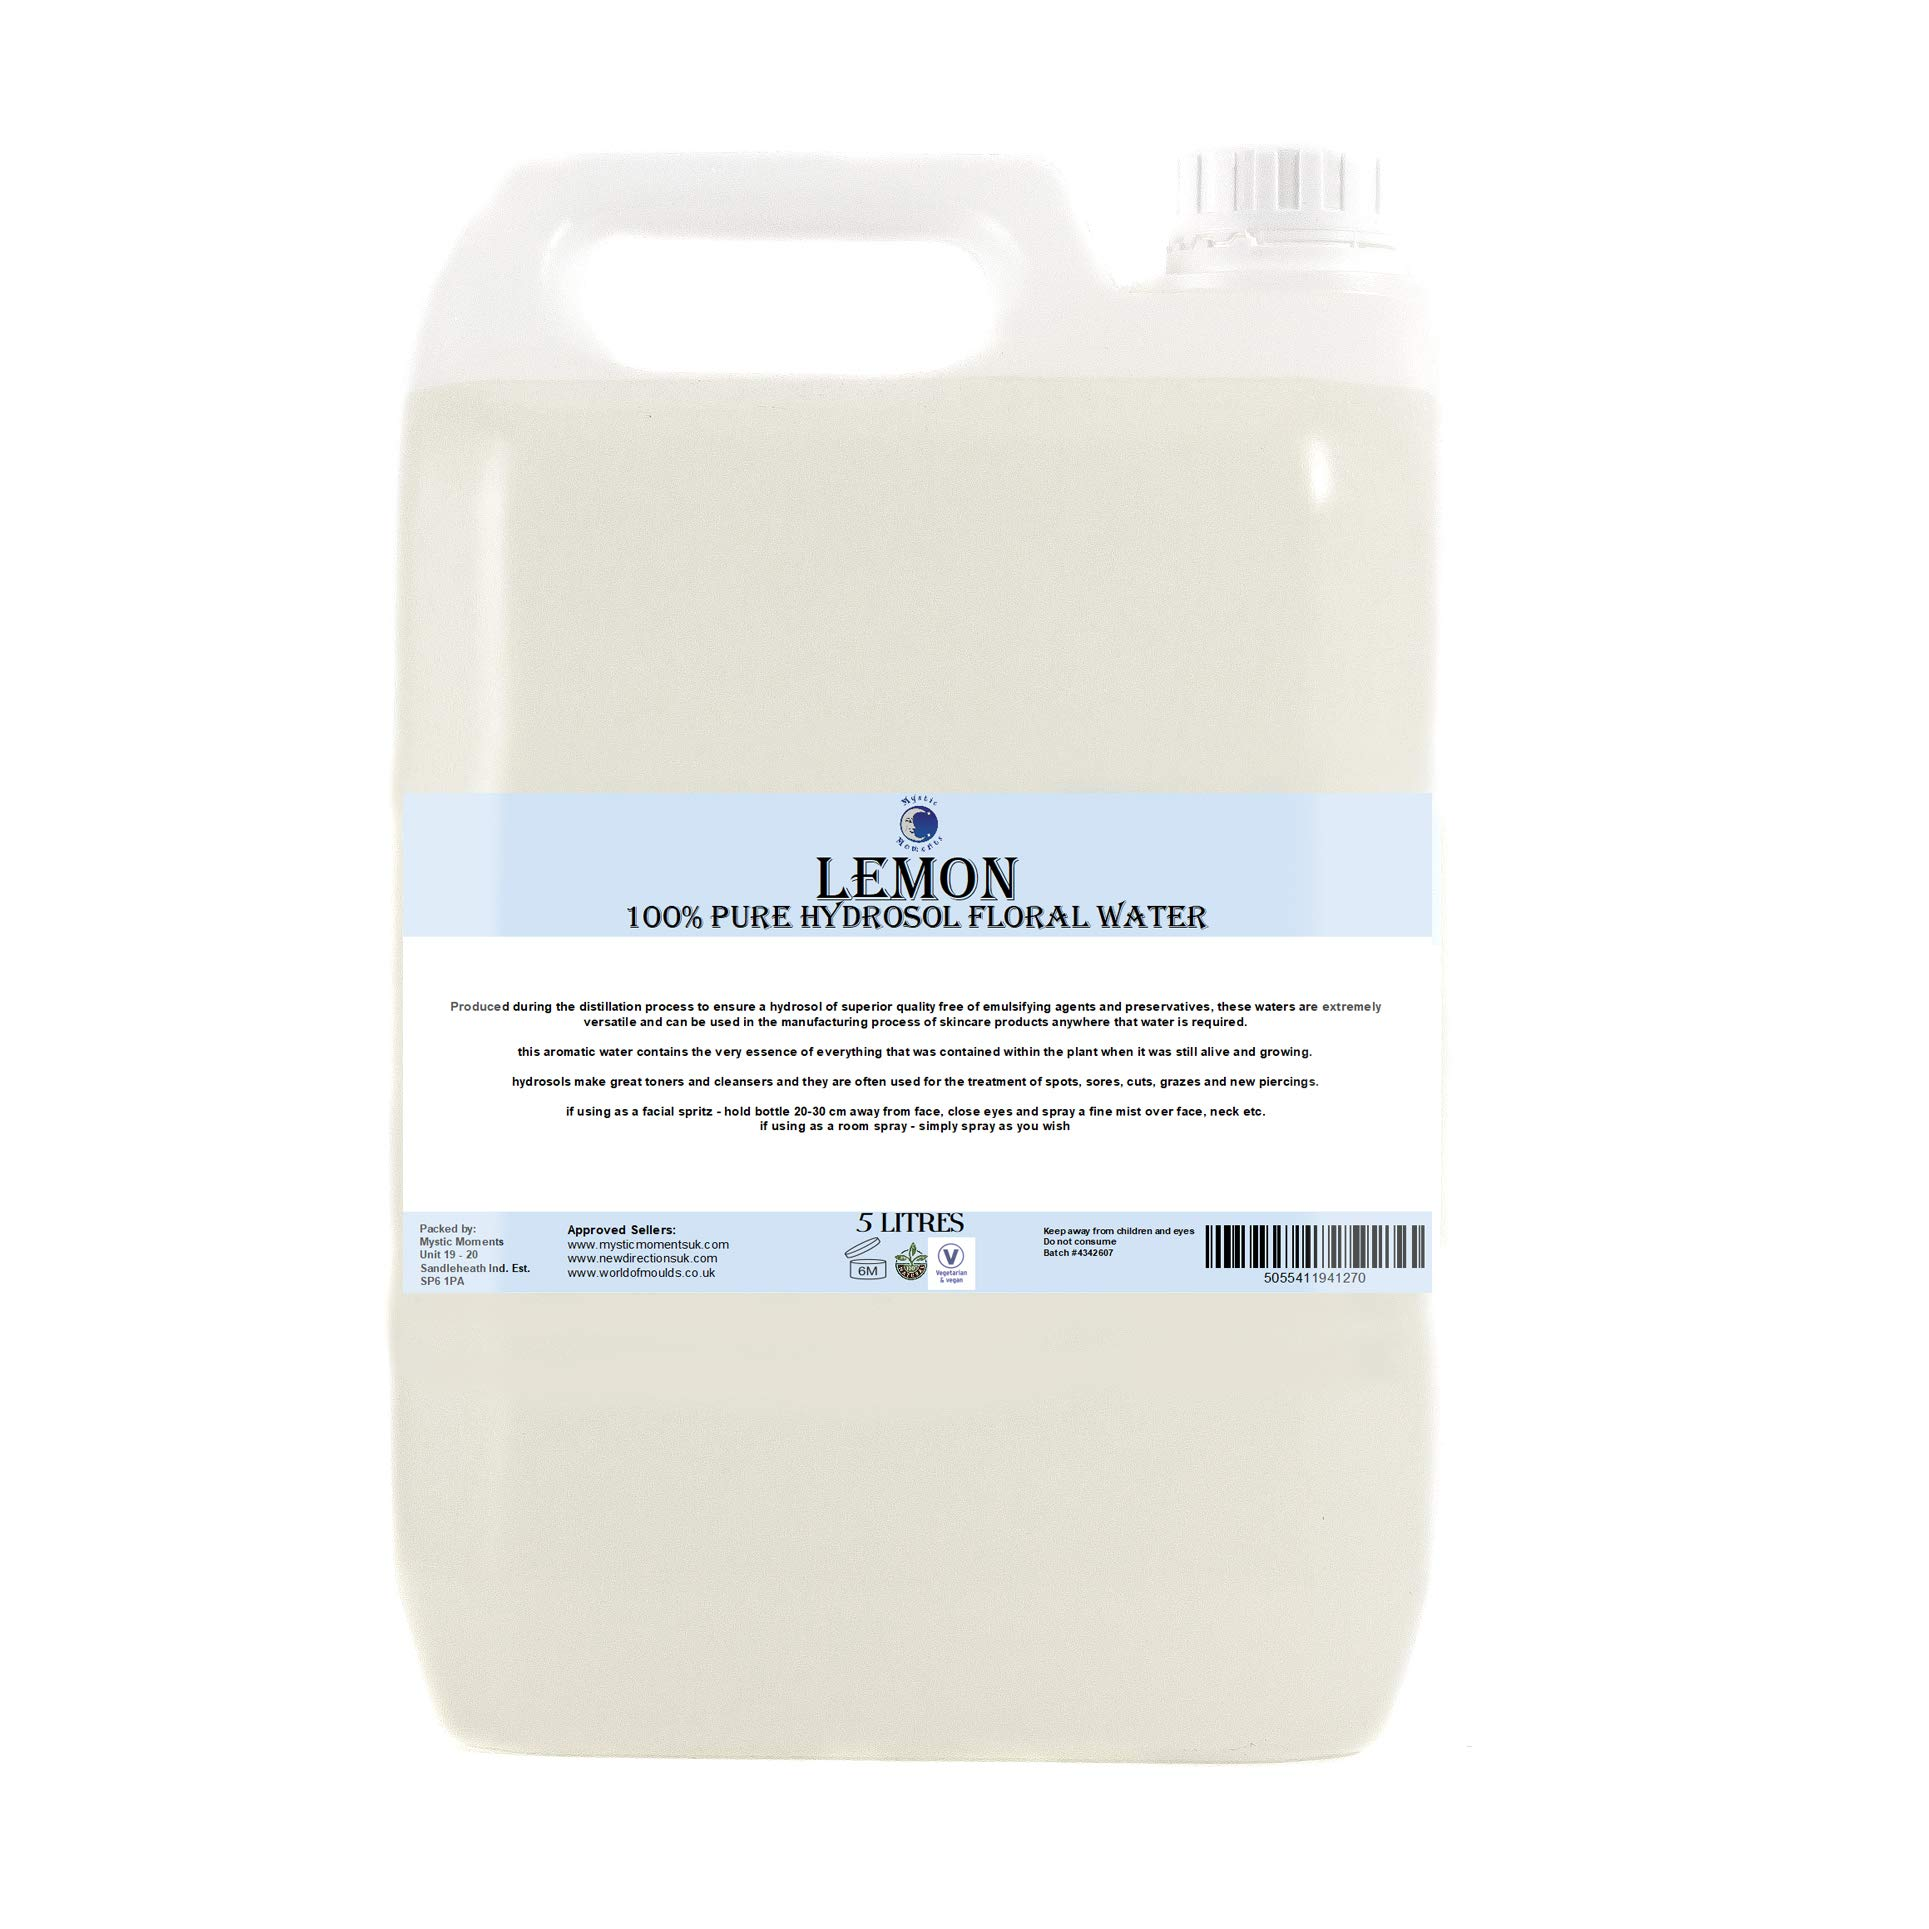 Lemon Hydrosol Floral Water - 5 Litres